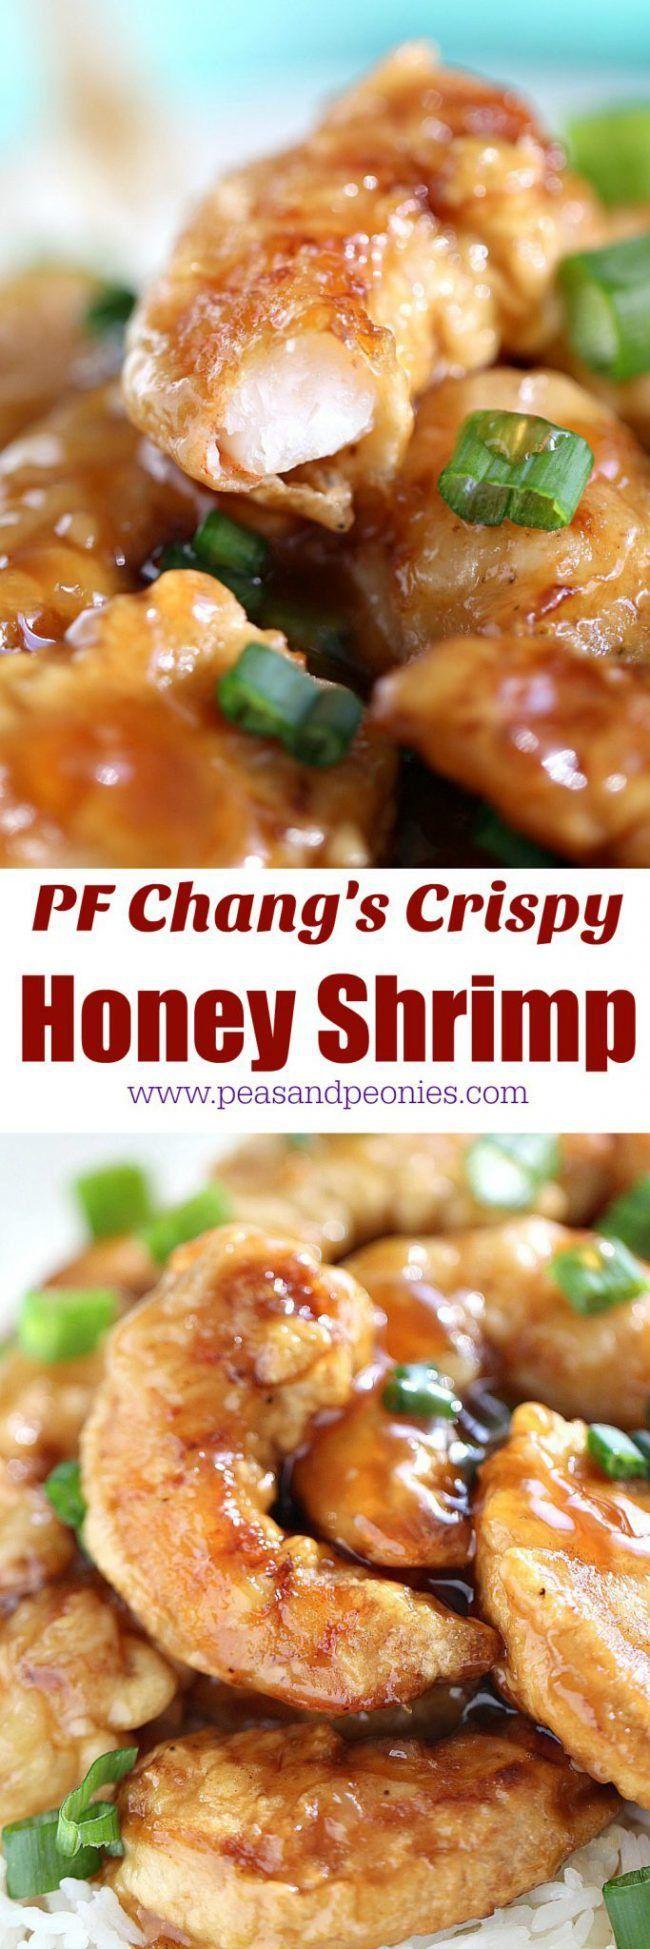 Photo of PF Chang's Crispy Honey Shrimp Copycat